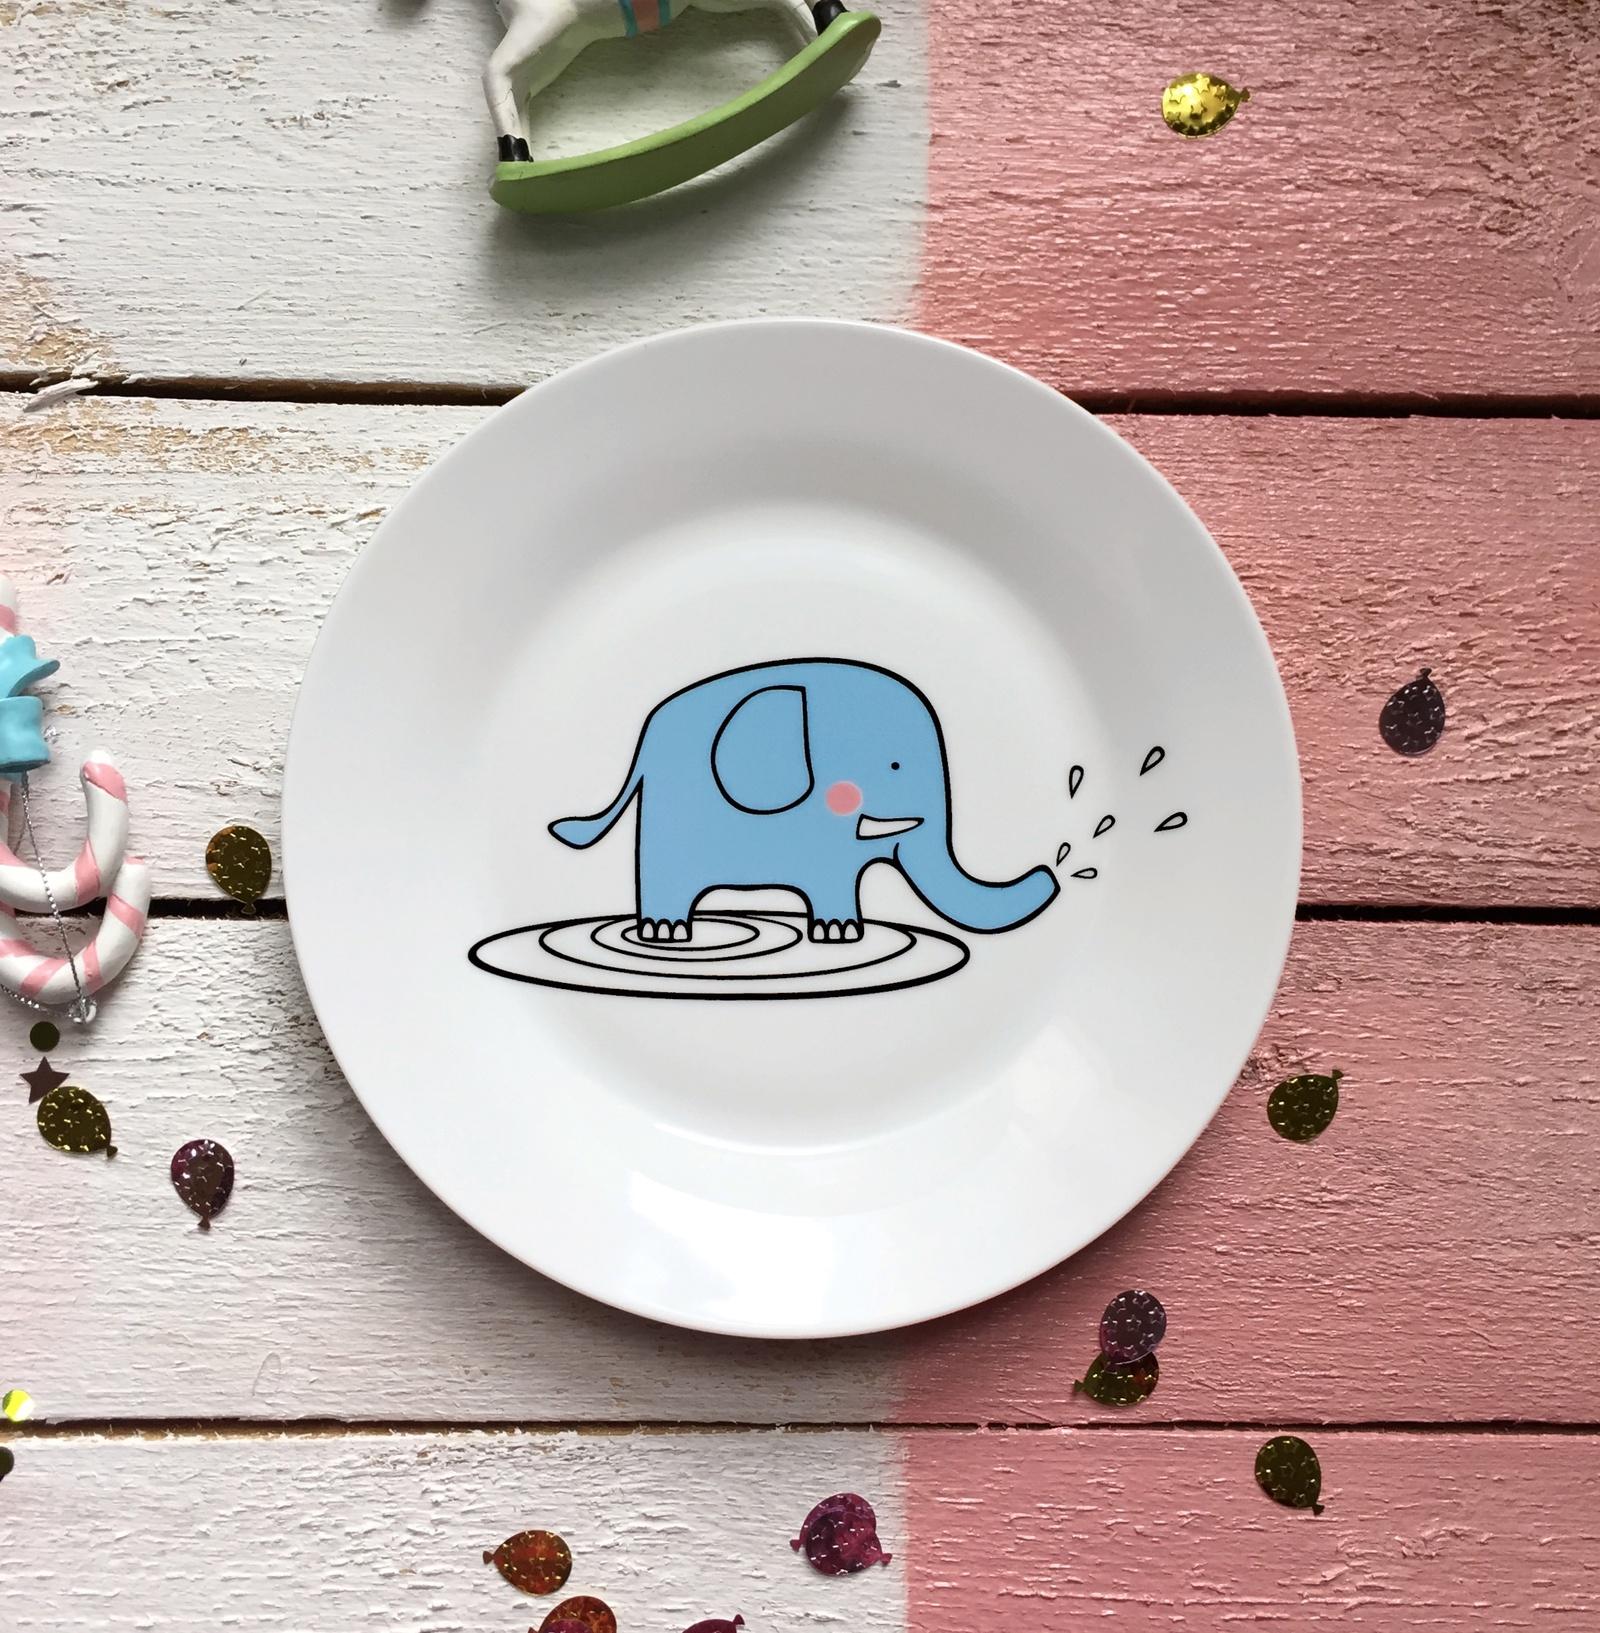 Тарелка Слон Бубон 20 см тарелка сотвори чудо слон бубон 20 см фарфор